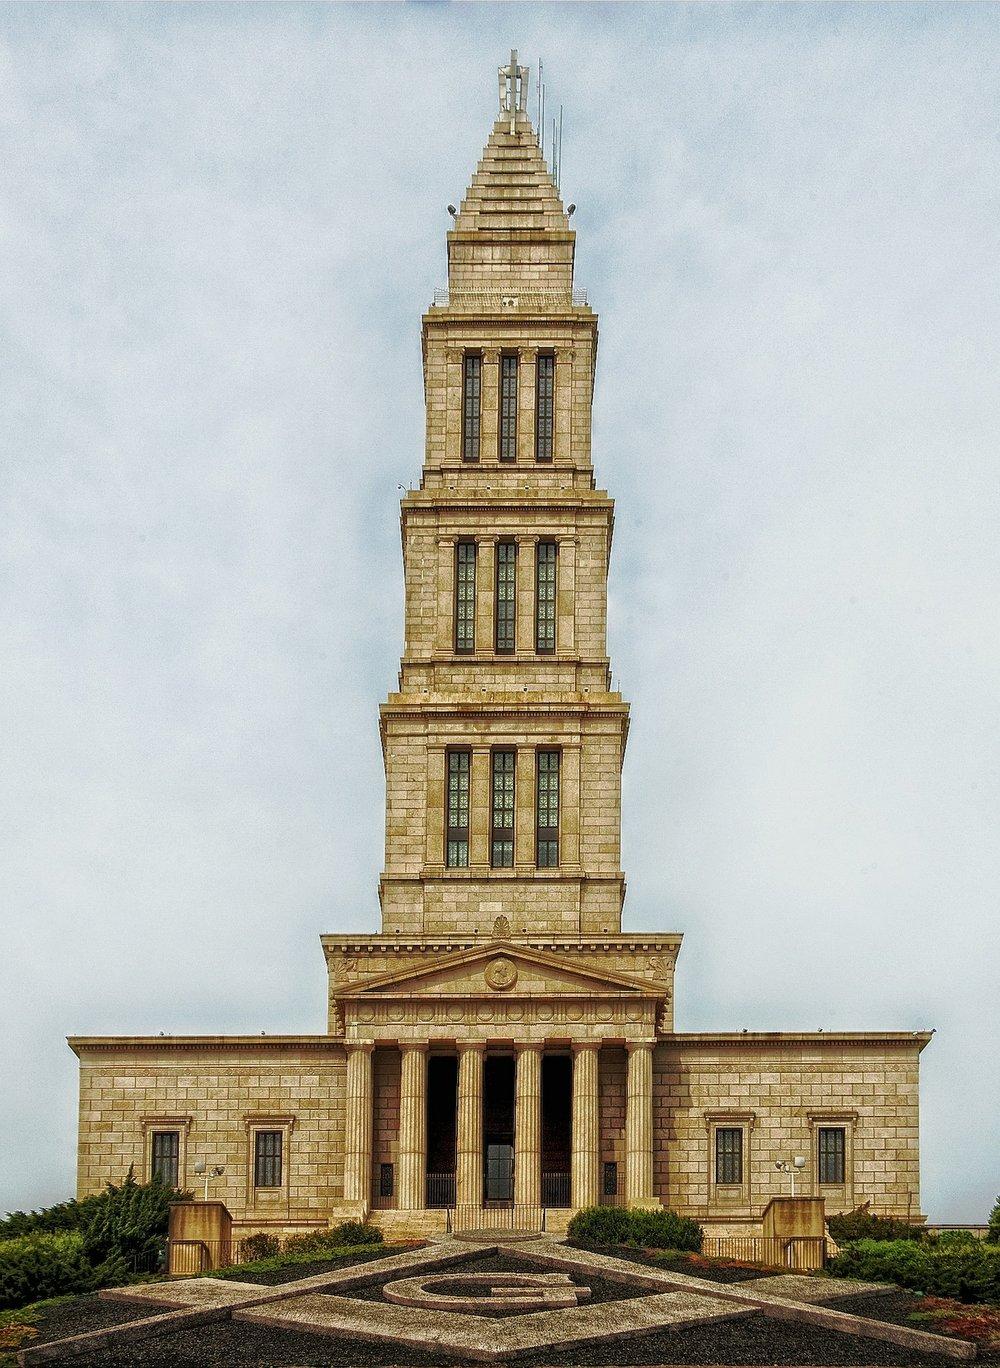 masonic-temple-403126_1920.jpg